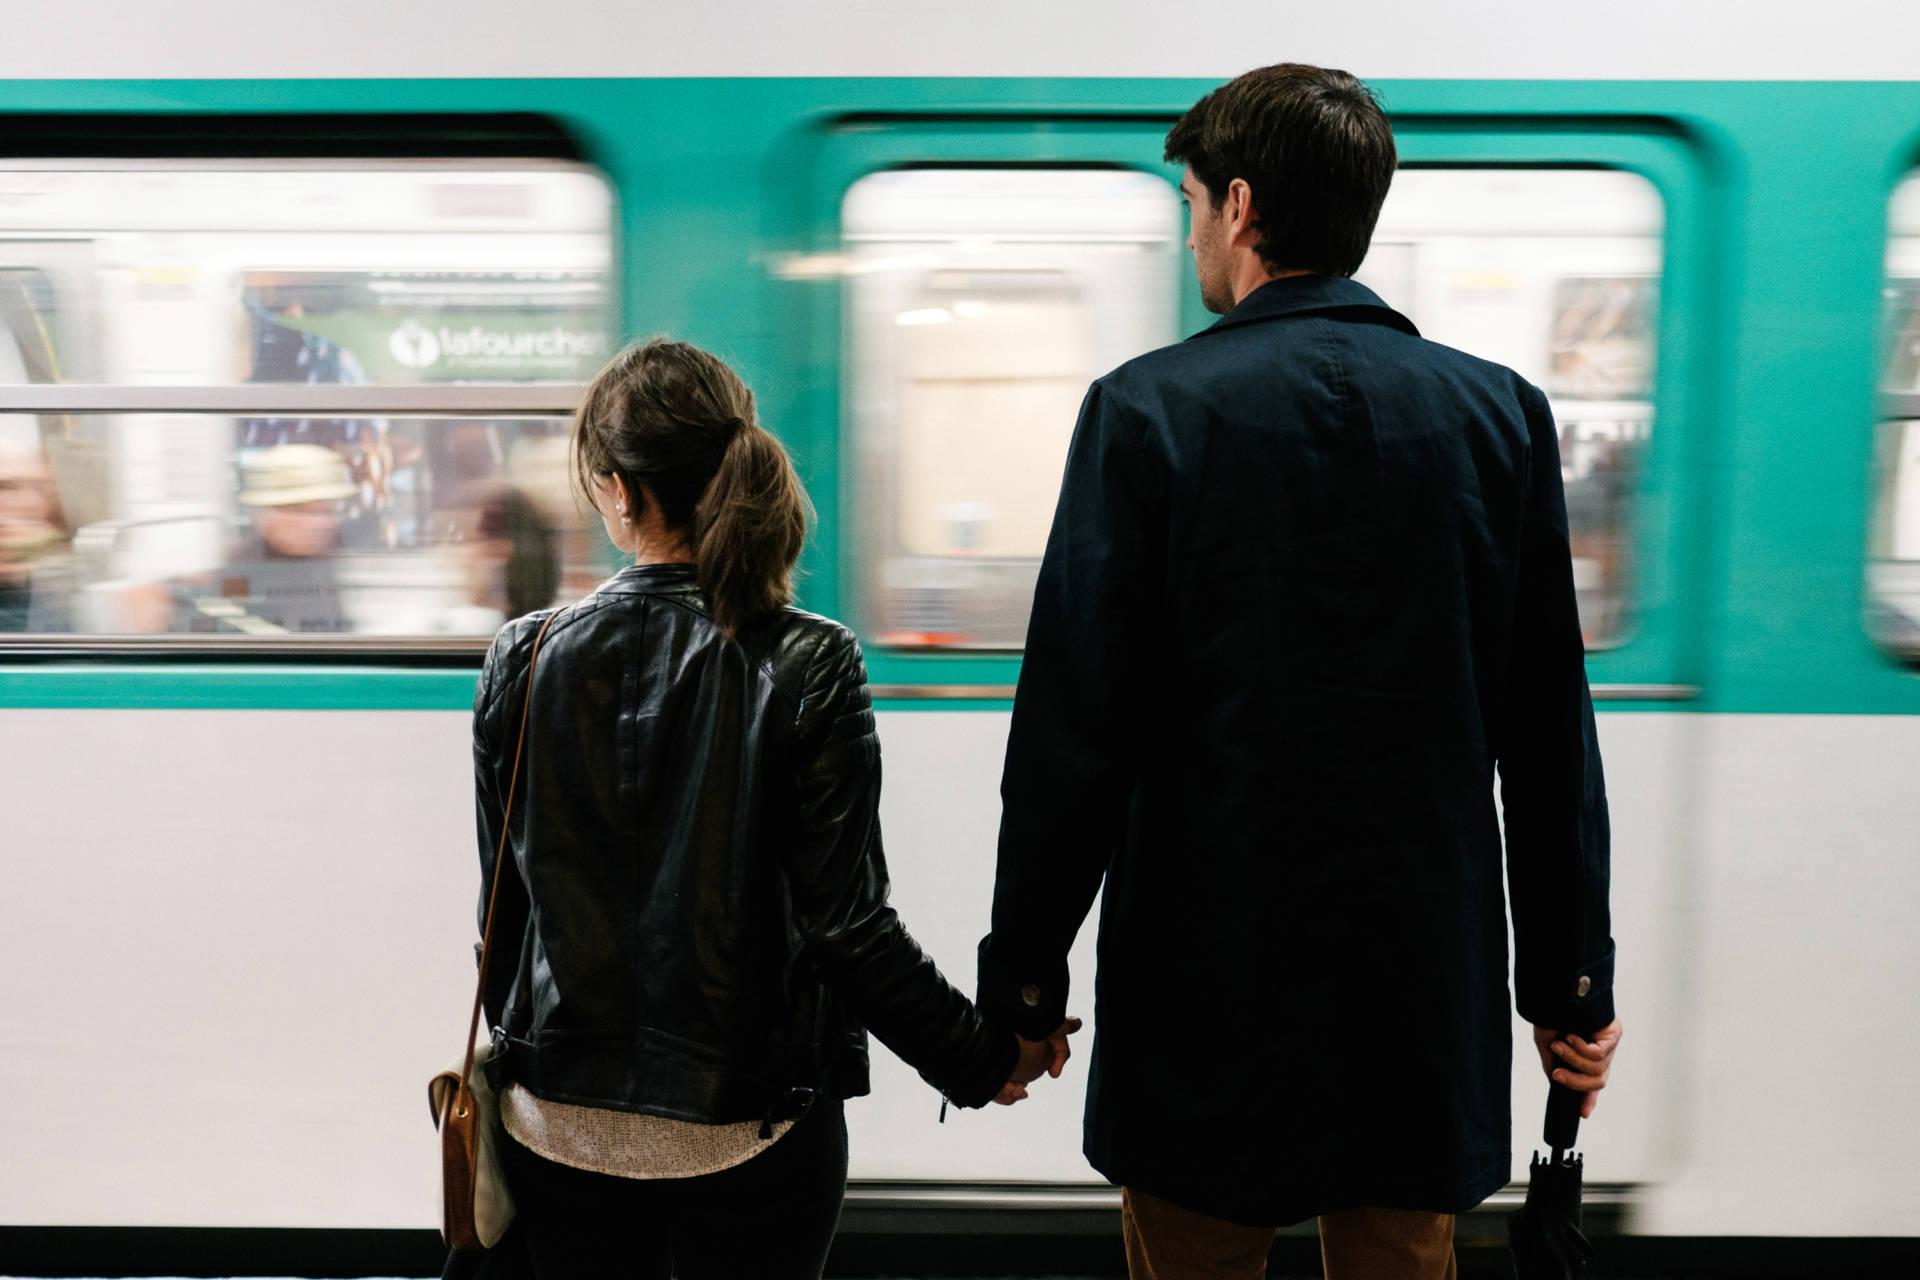 Session couple - engagement